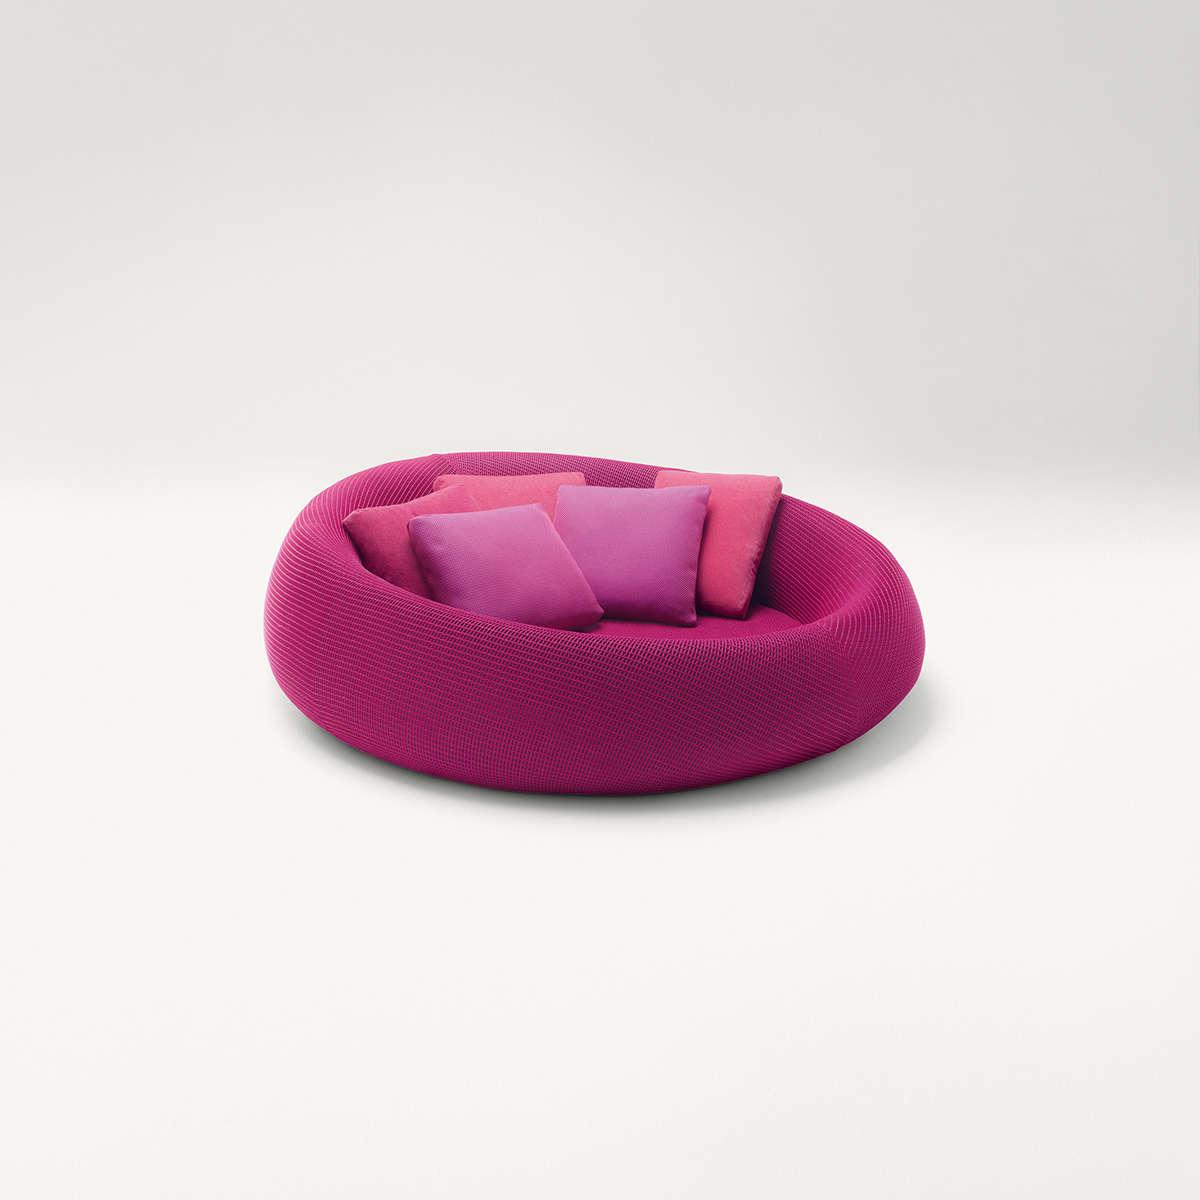 Ease Lounge seat